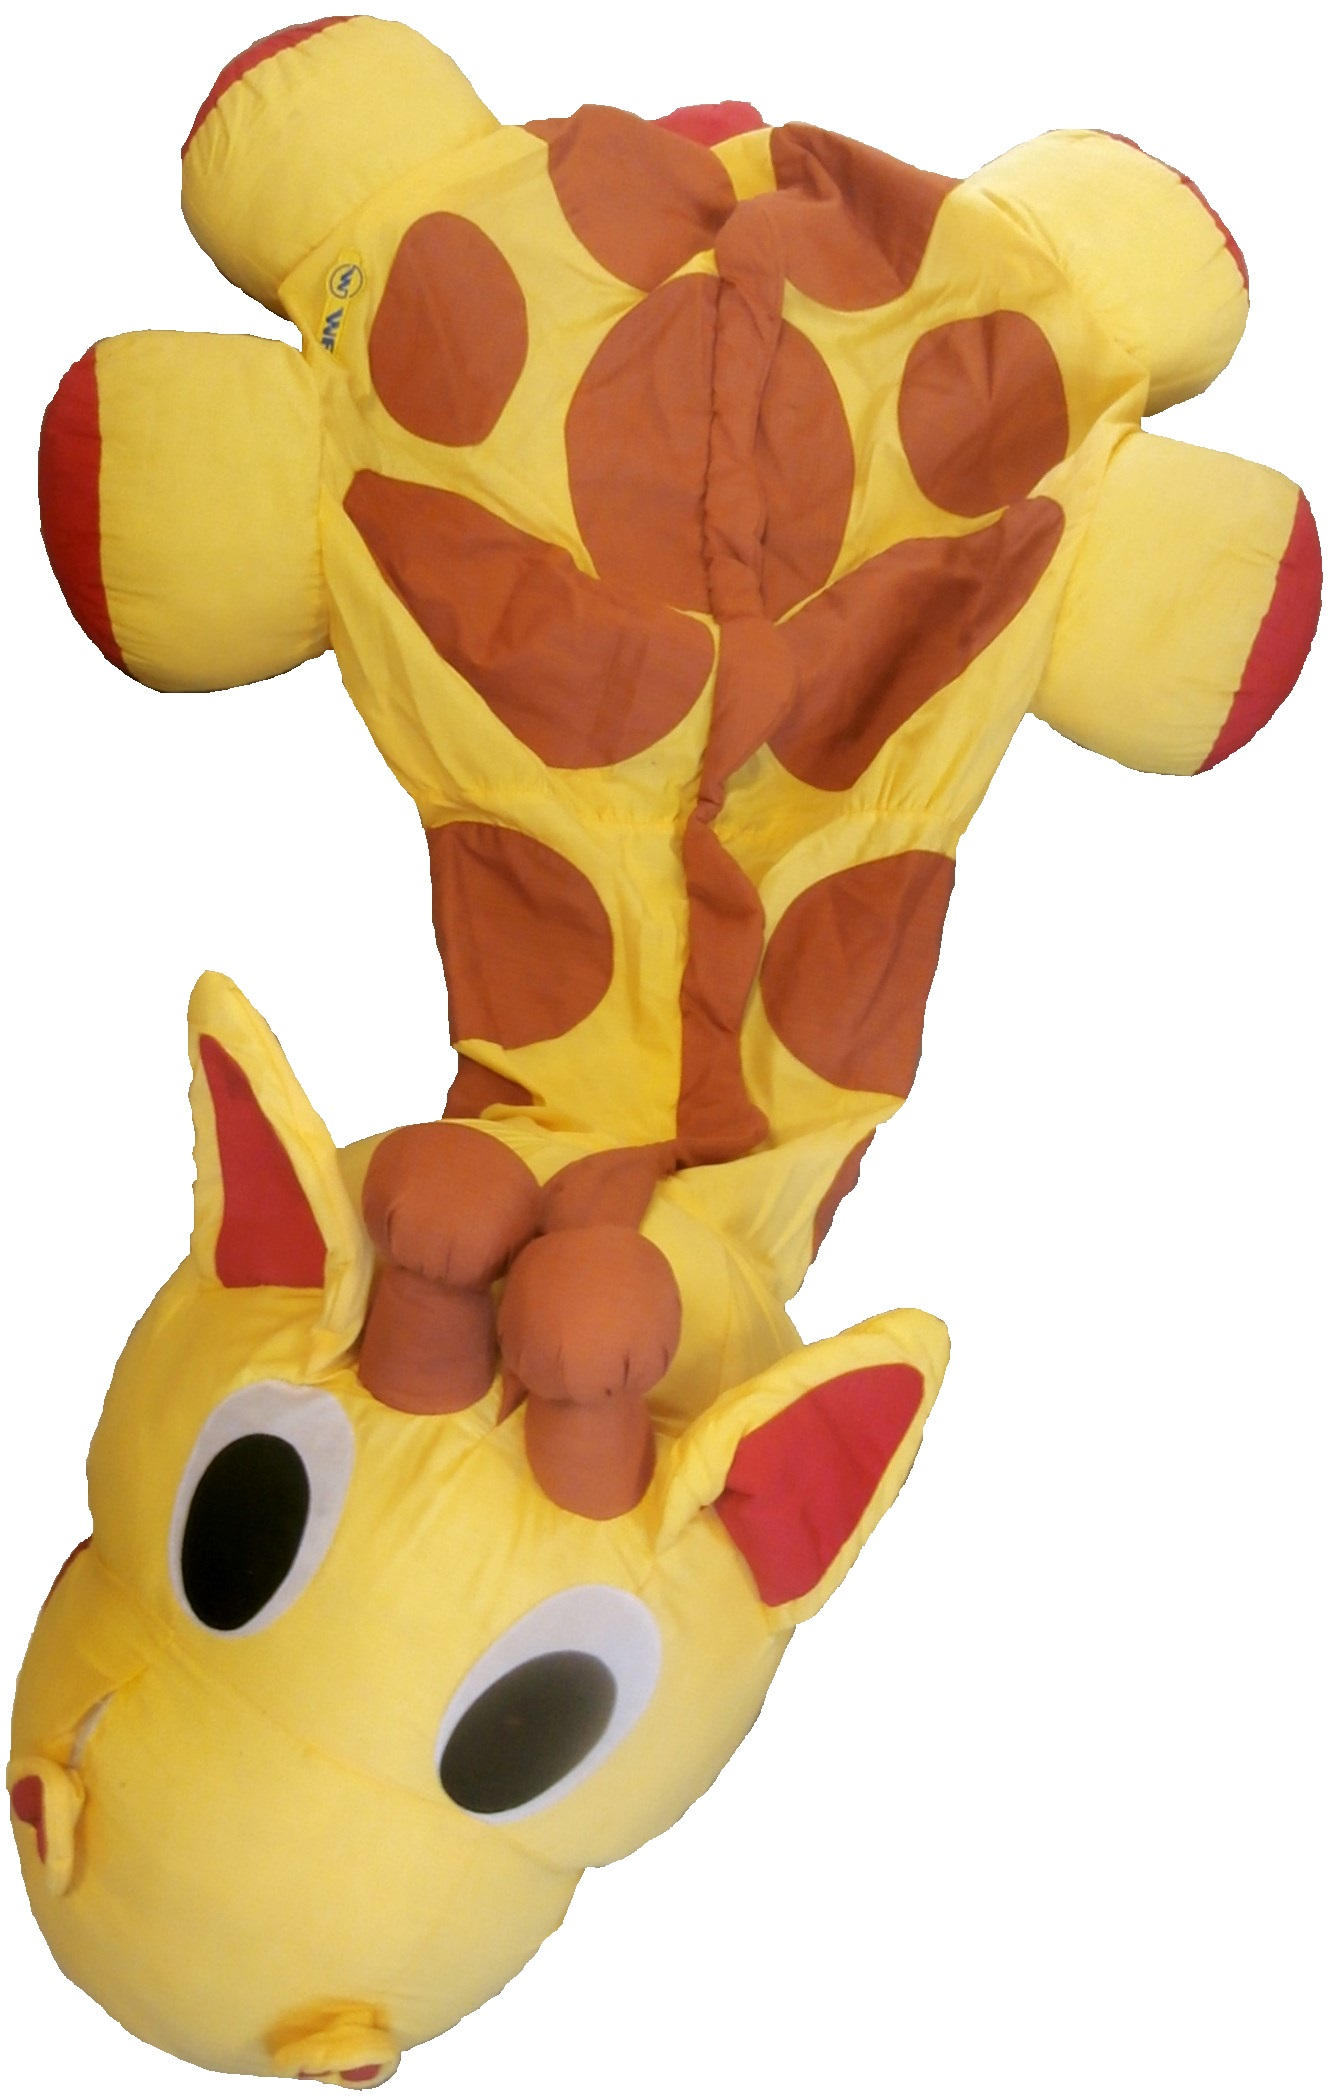 Coussin girafe Image